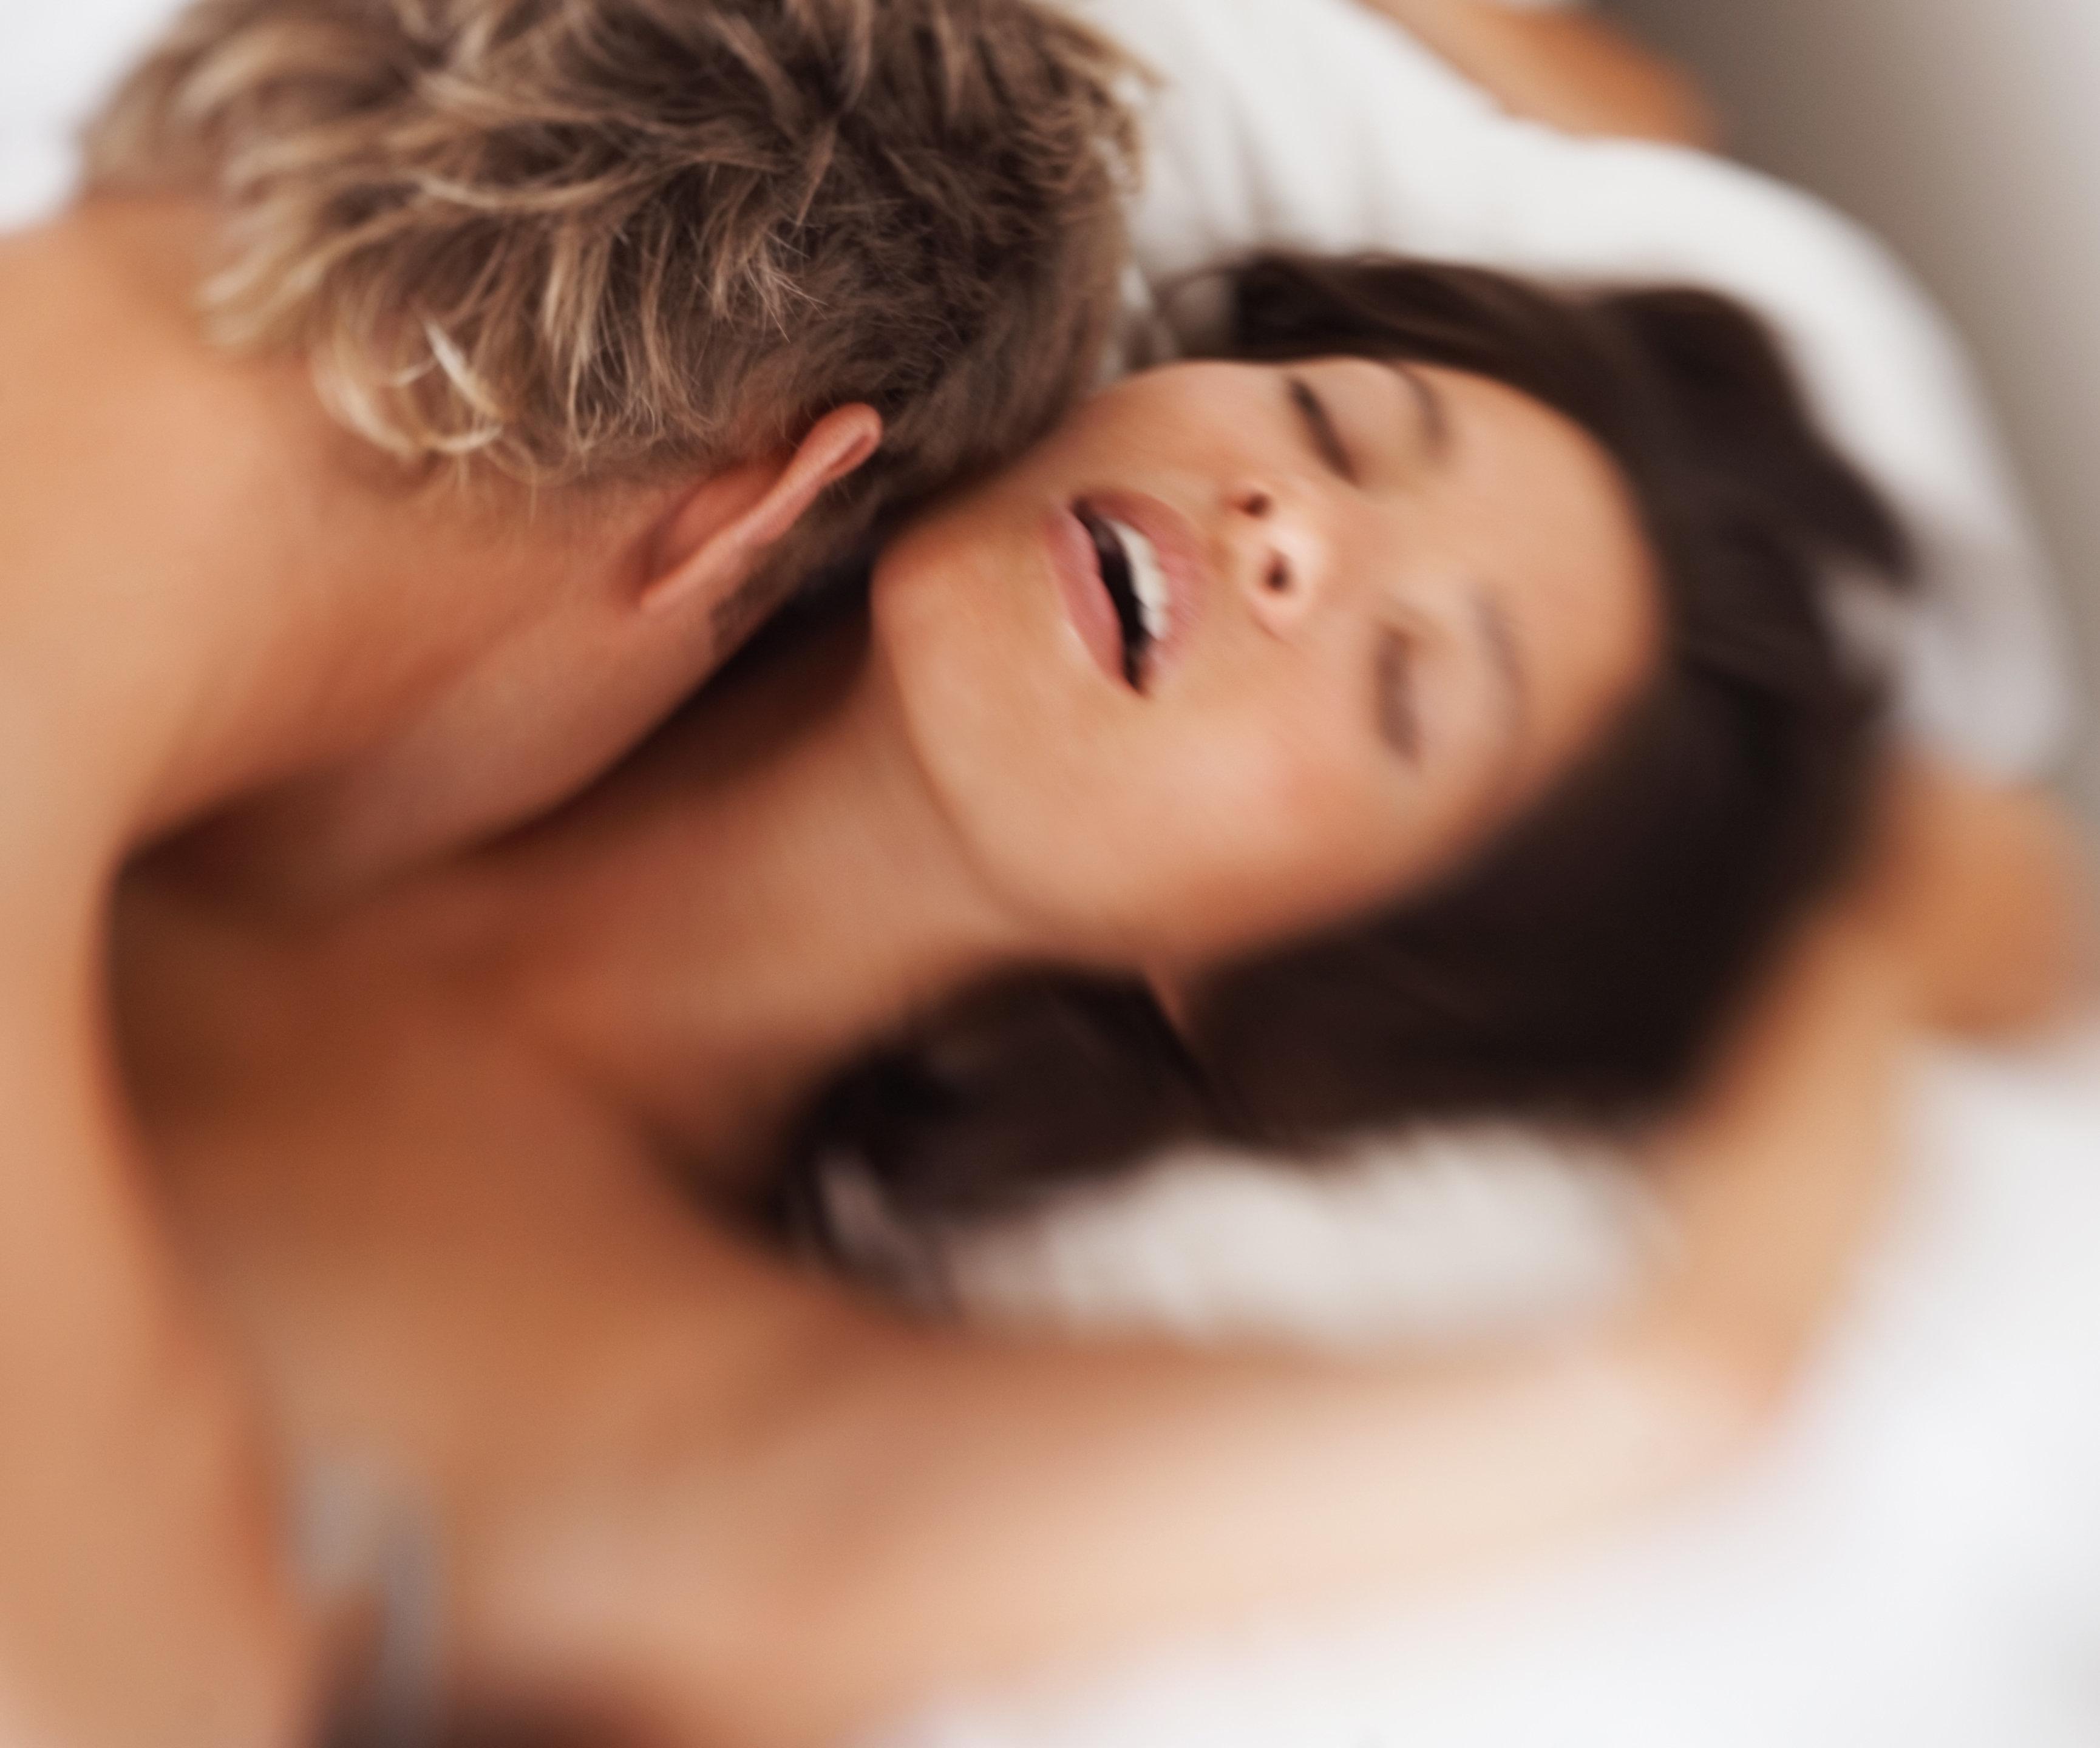 Best online porn for women